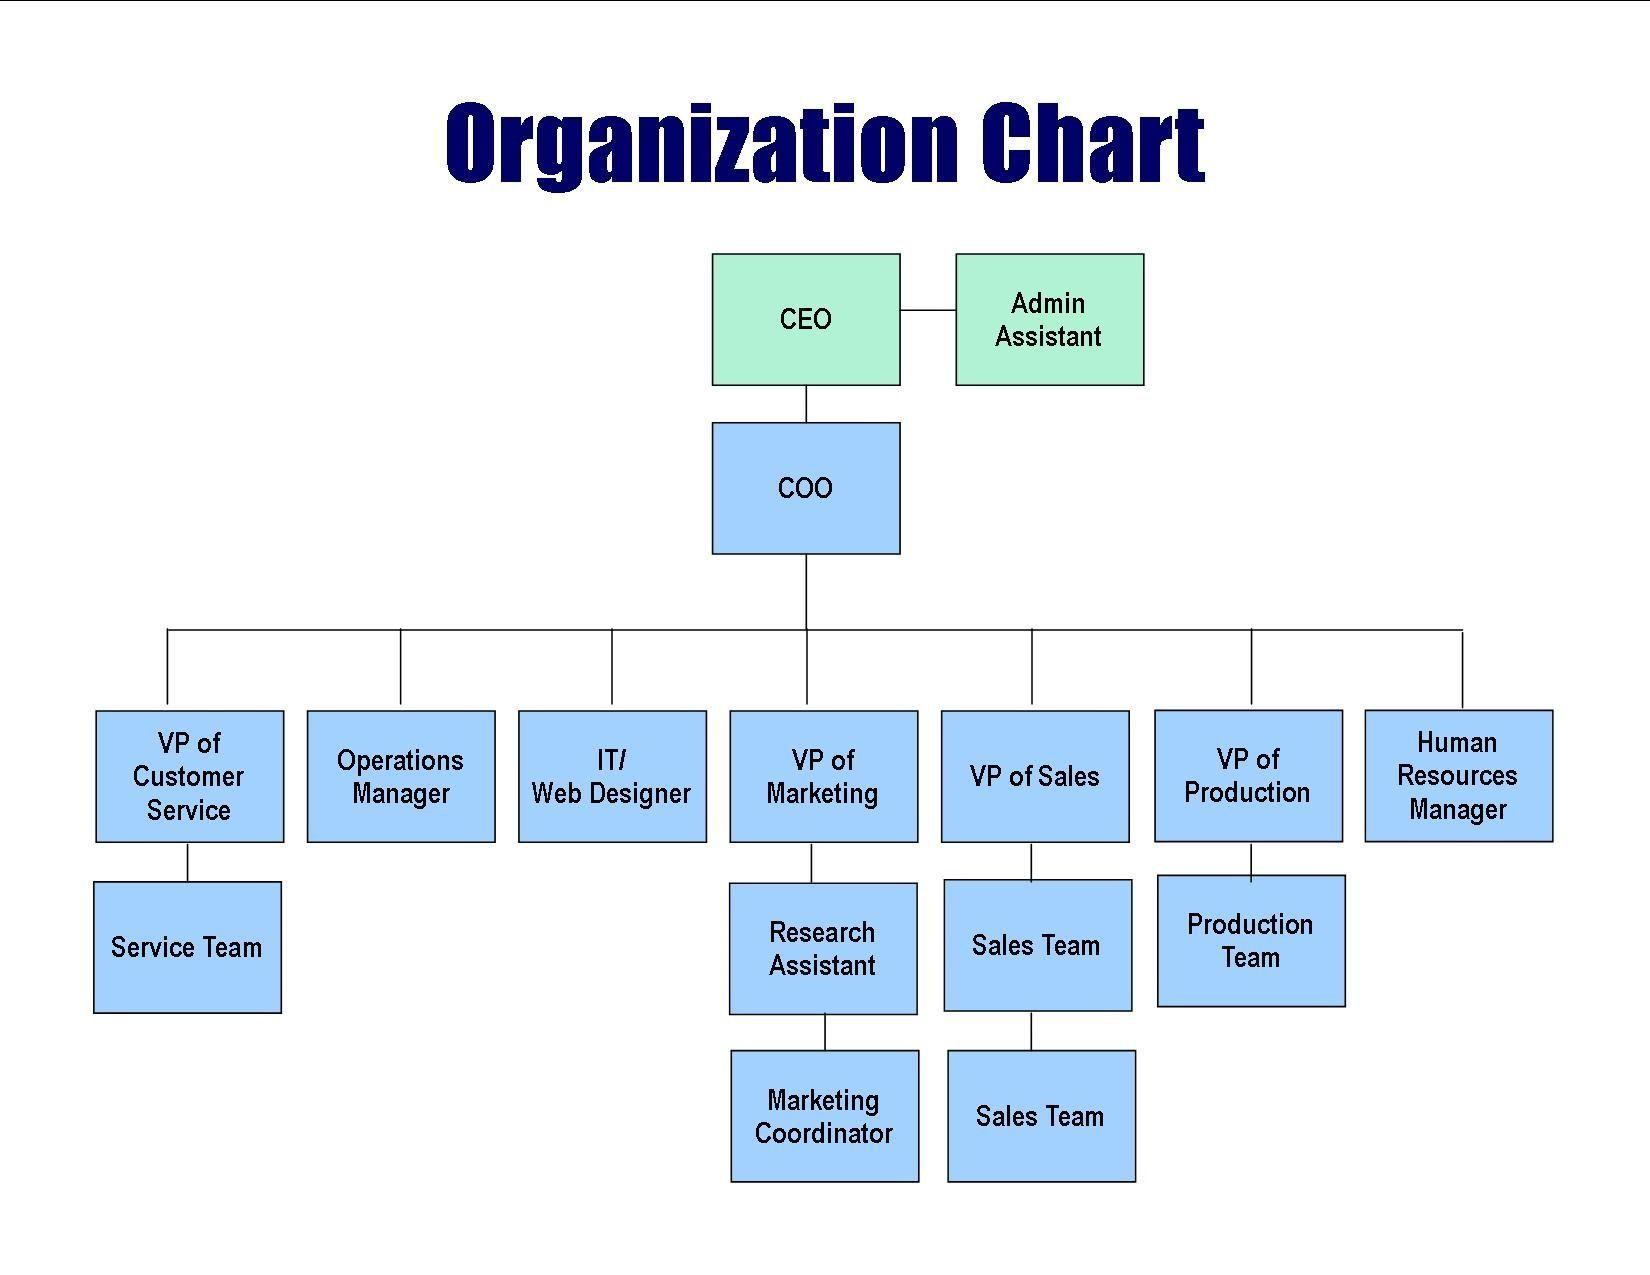 005 Beautiful Microsoft Organizational Chart Template Image  Templates Visio Org M Office Organization PowerpointFull